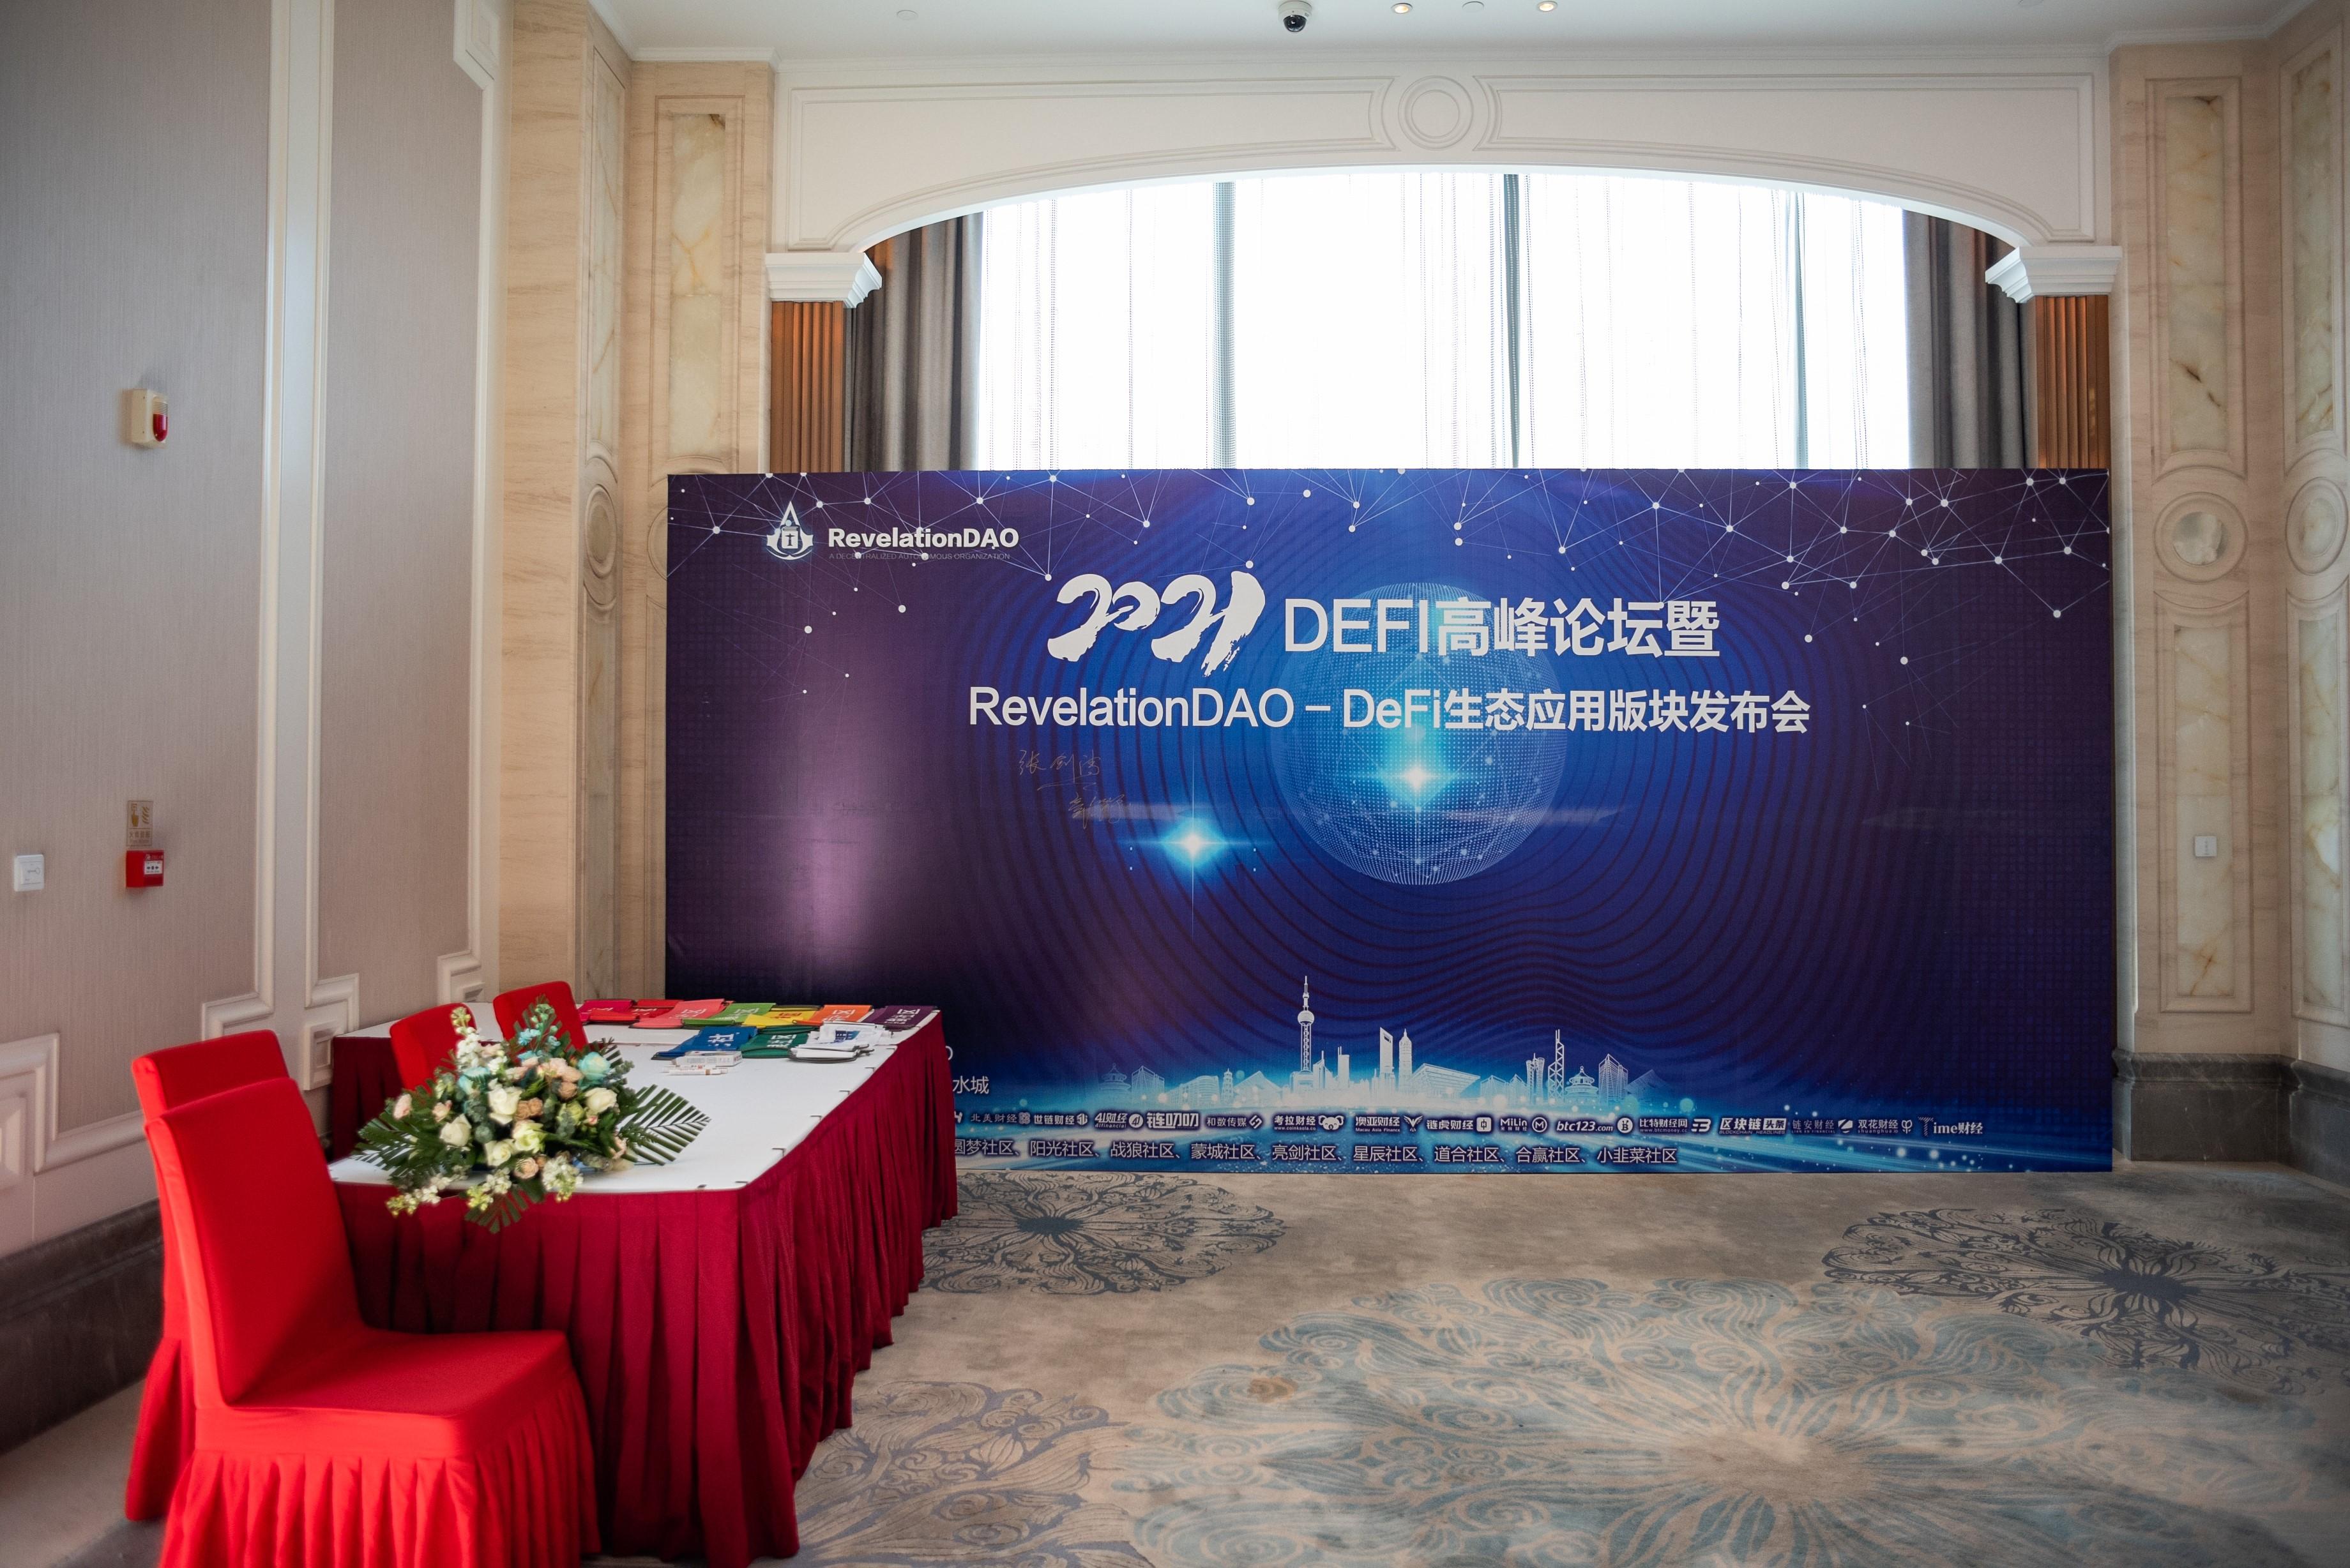 DeFi2021区块链高峰论坛 暨RevelationDAO-DeFi生态应用板块发布会圆满落幕